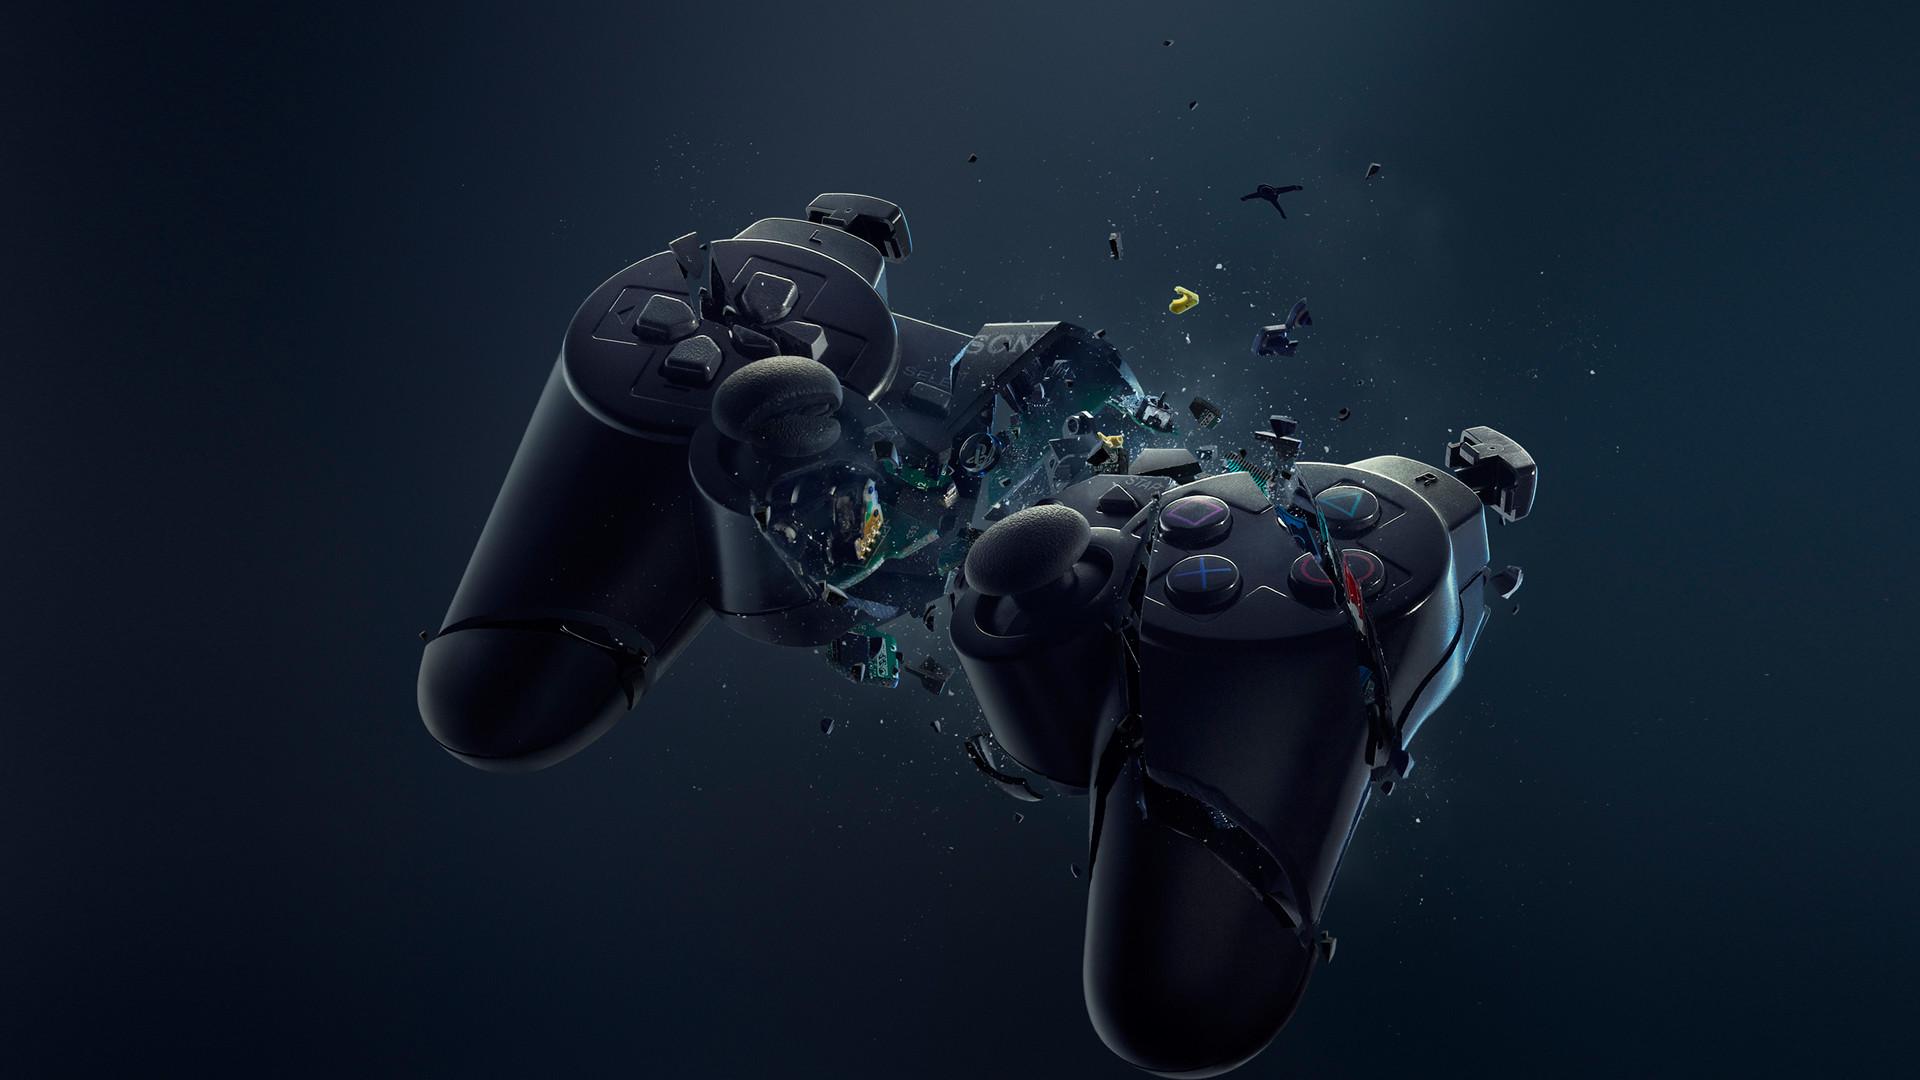 3D Broke Game Controller Desktop Wallpaper